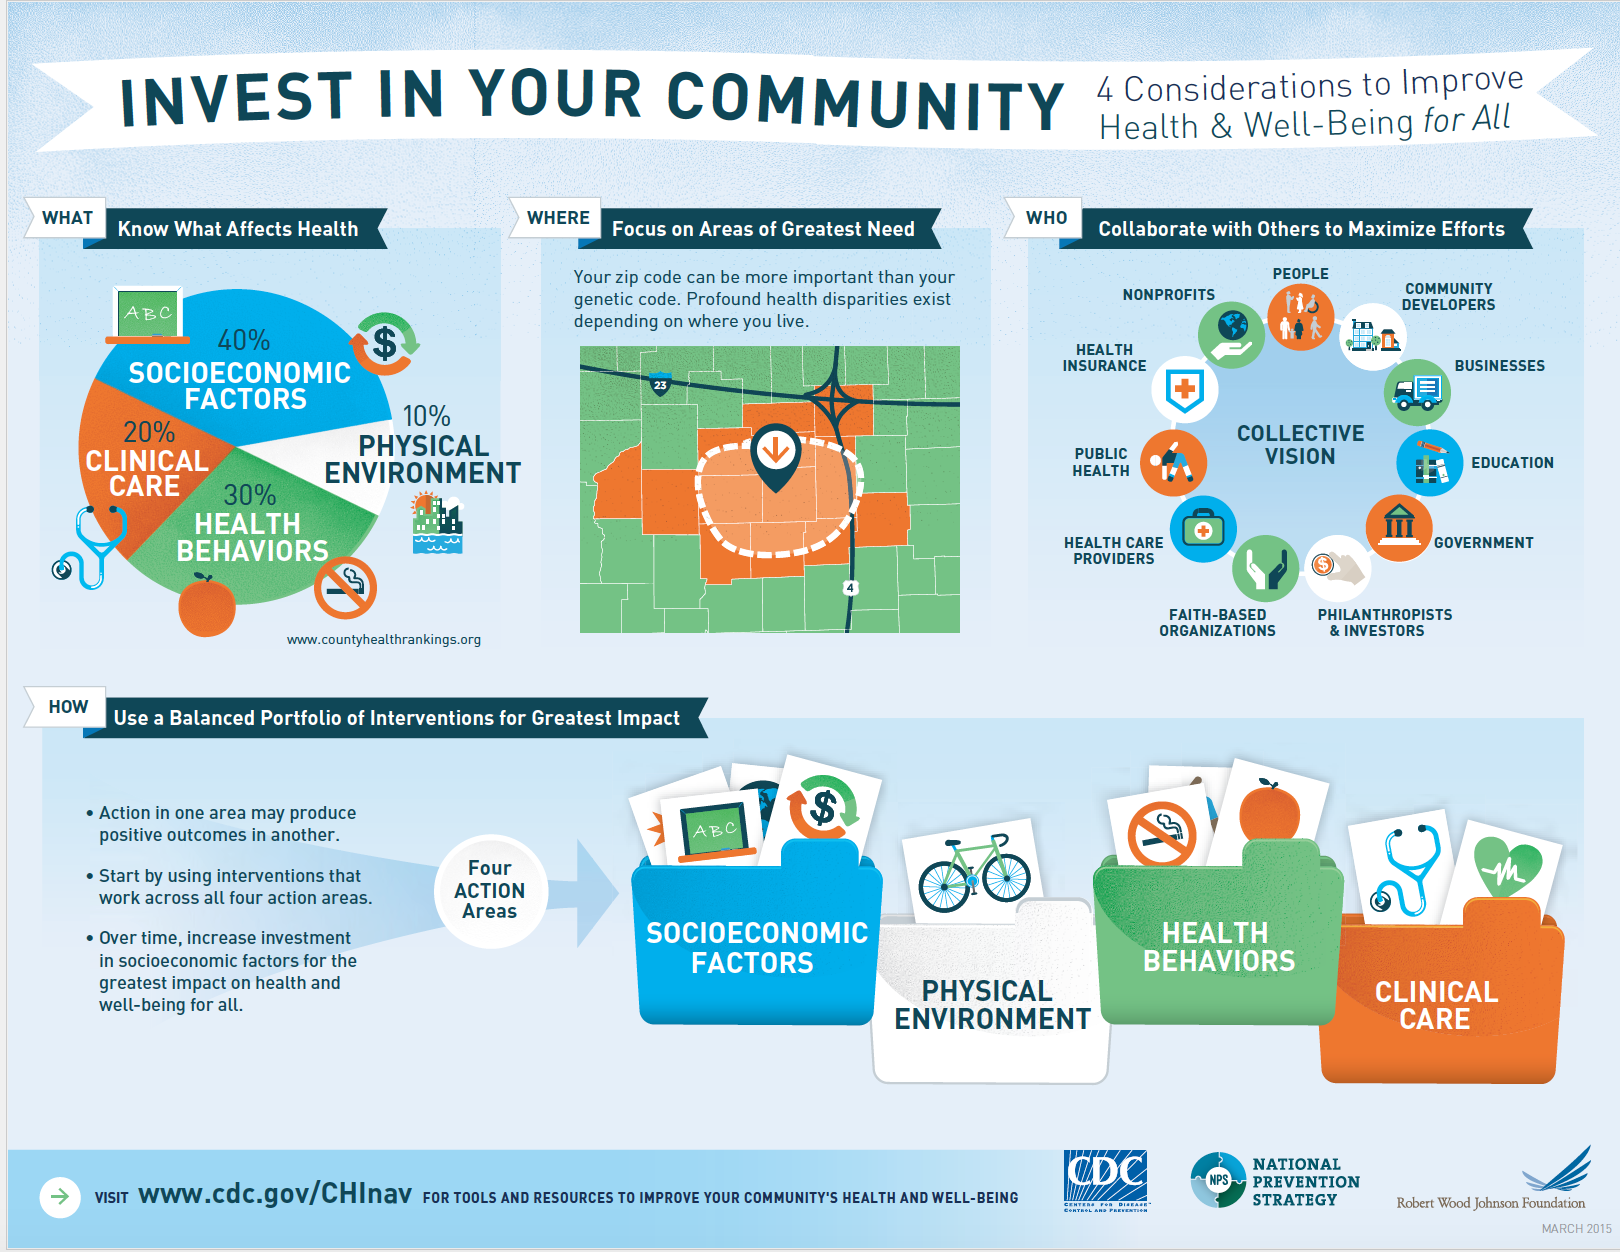 CDC. (2015). CDC Community Health Improvement Navigator. Retrieved from http://www.cdc.gov/chinav/